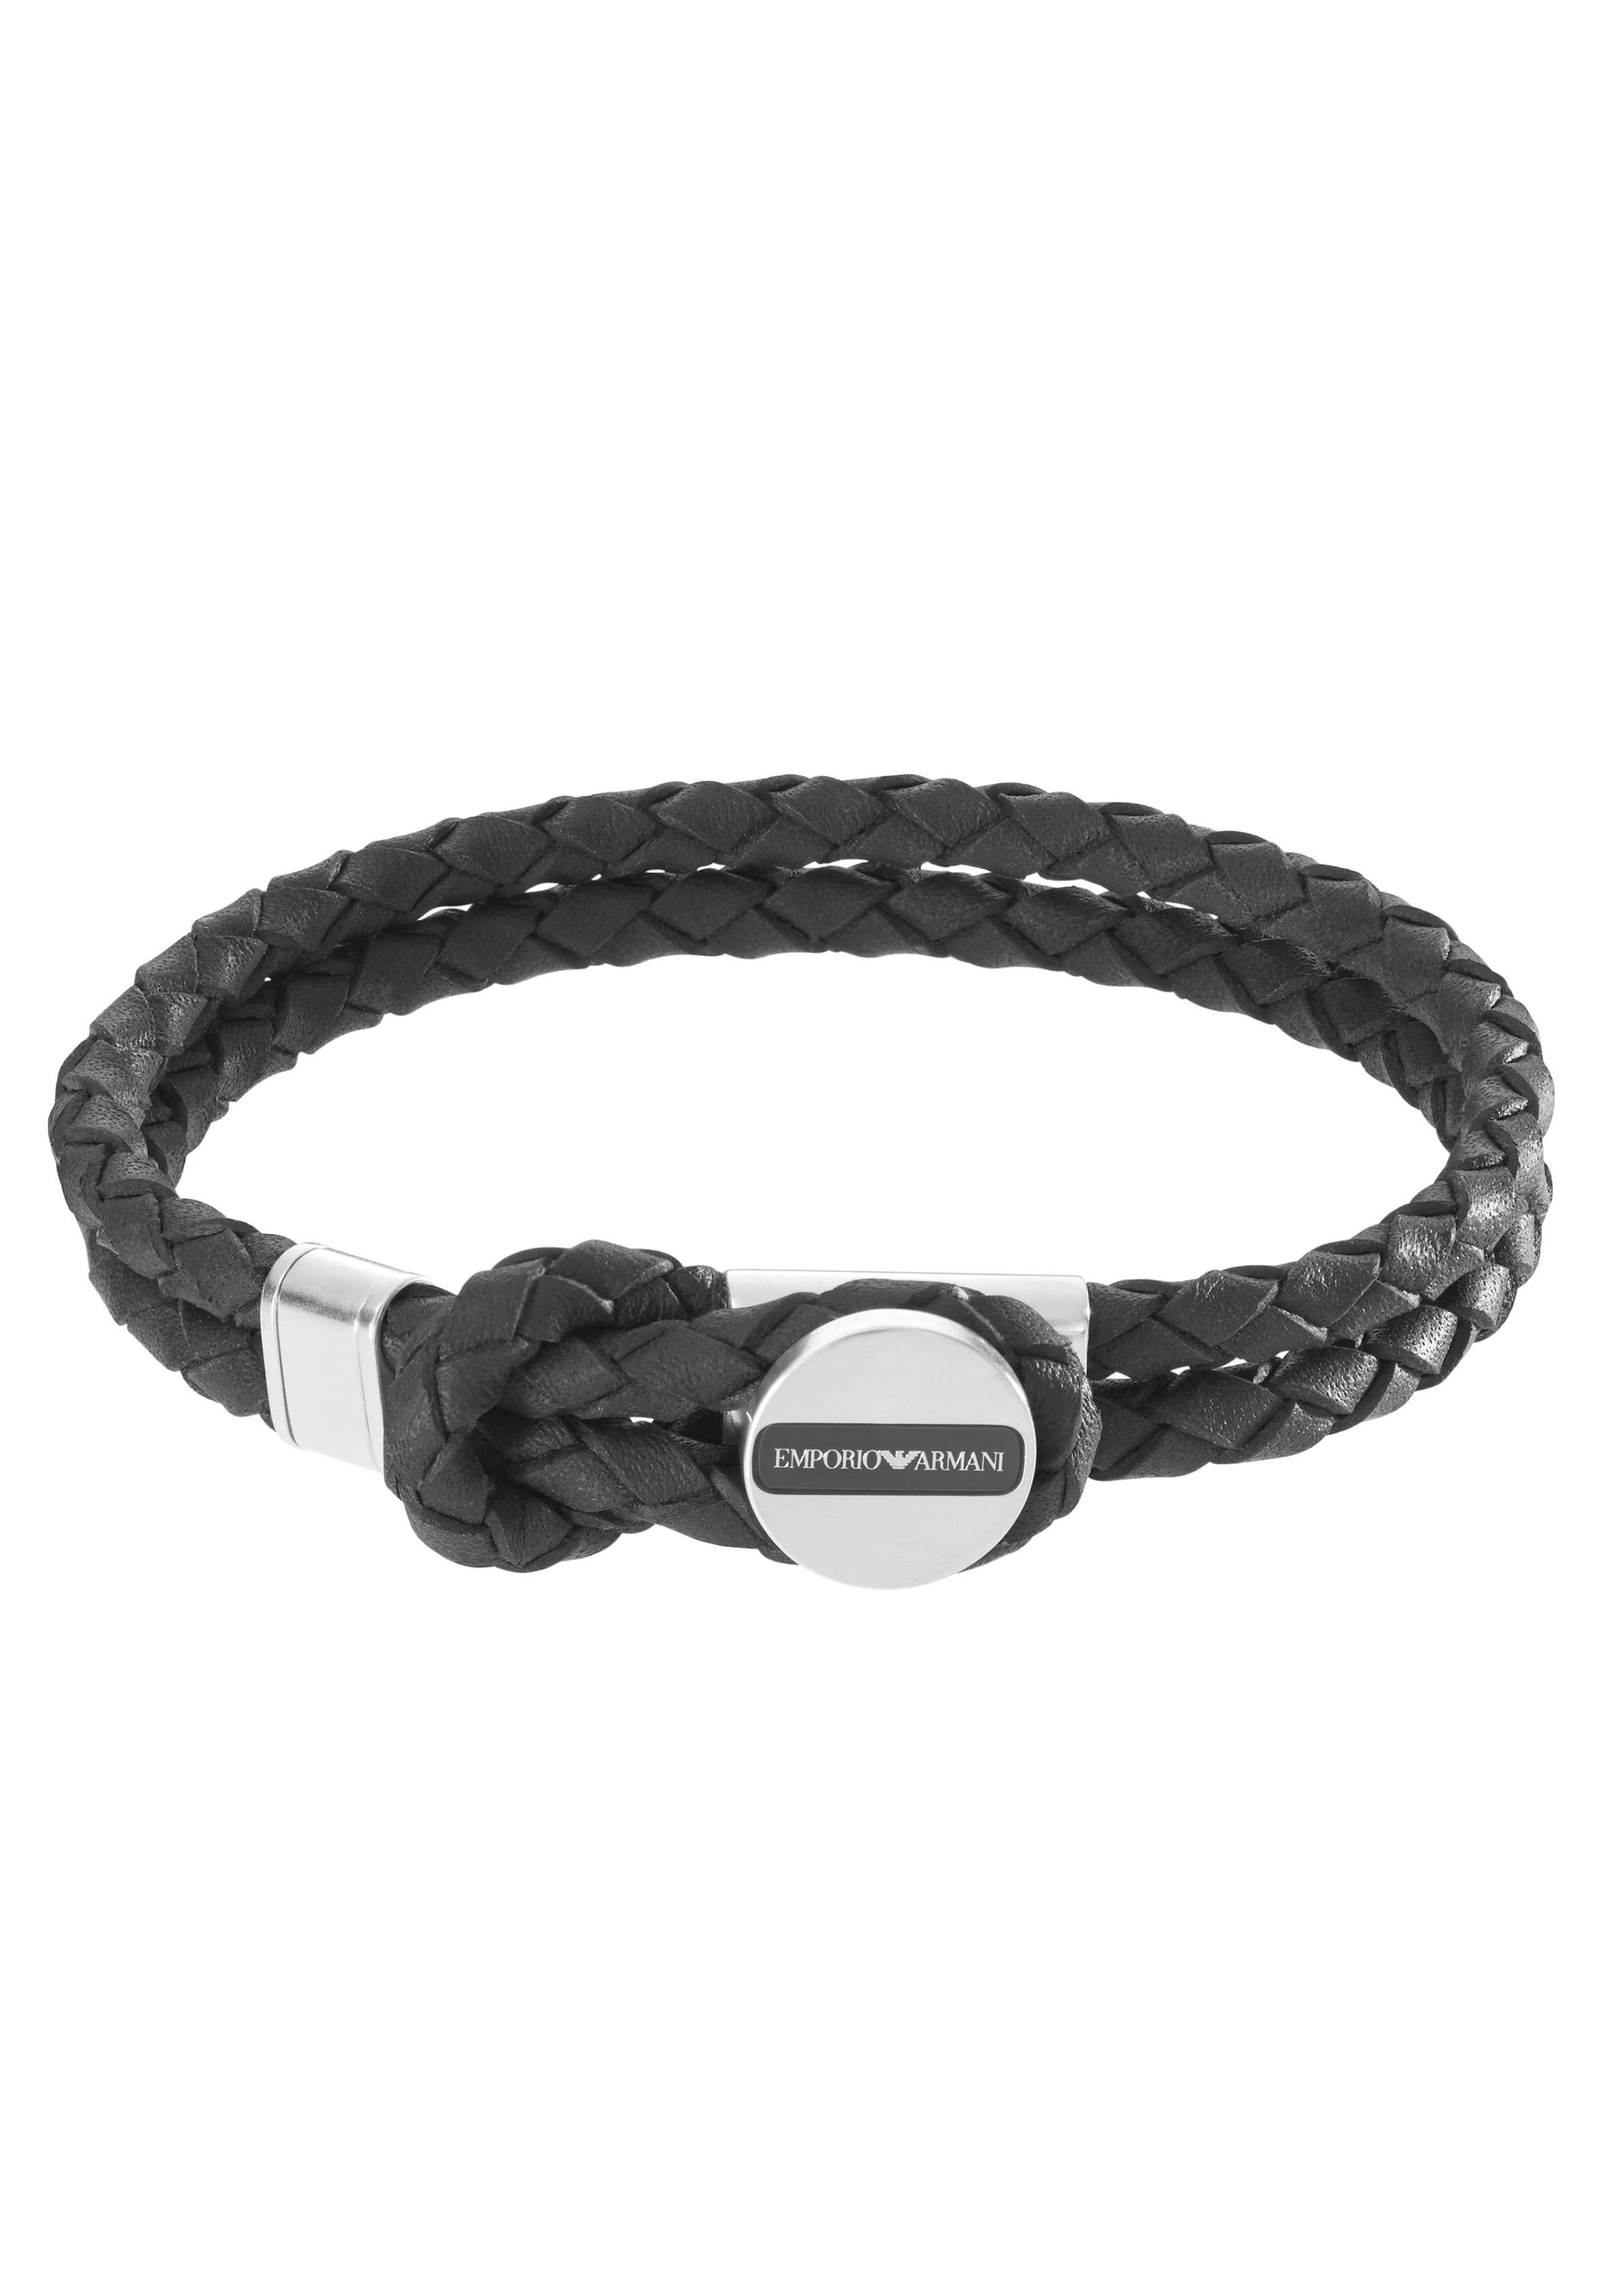 emporio armani -  Armband EGS2177221, EGS2178040